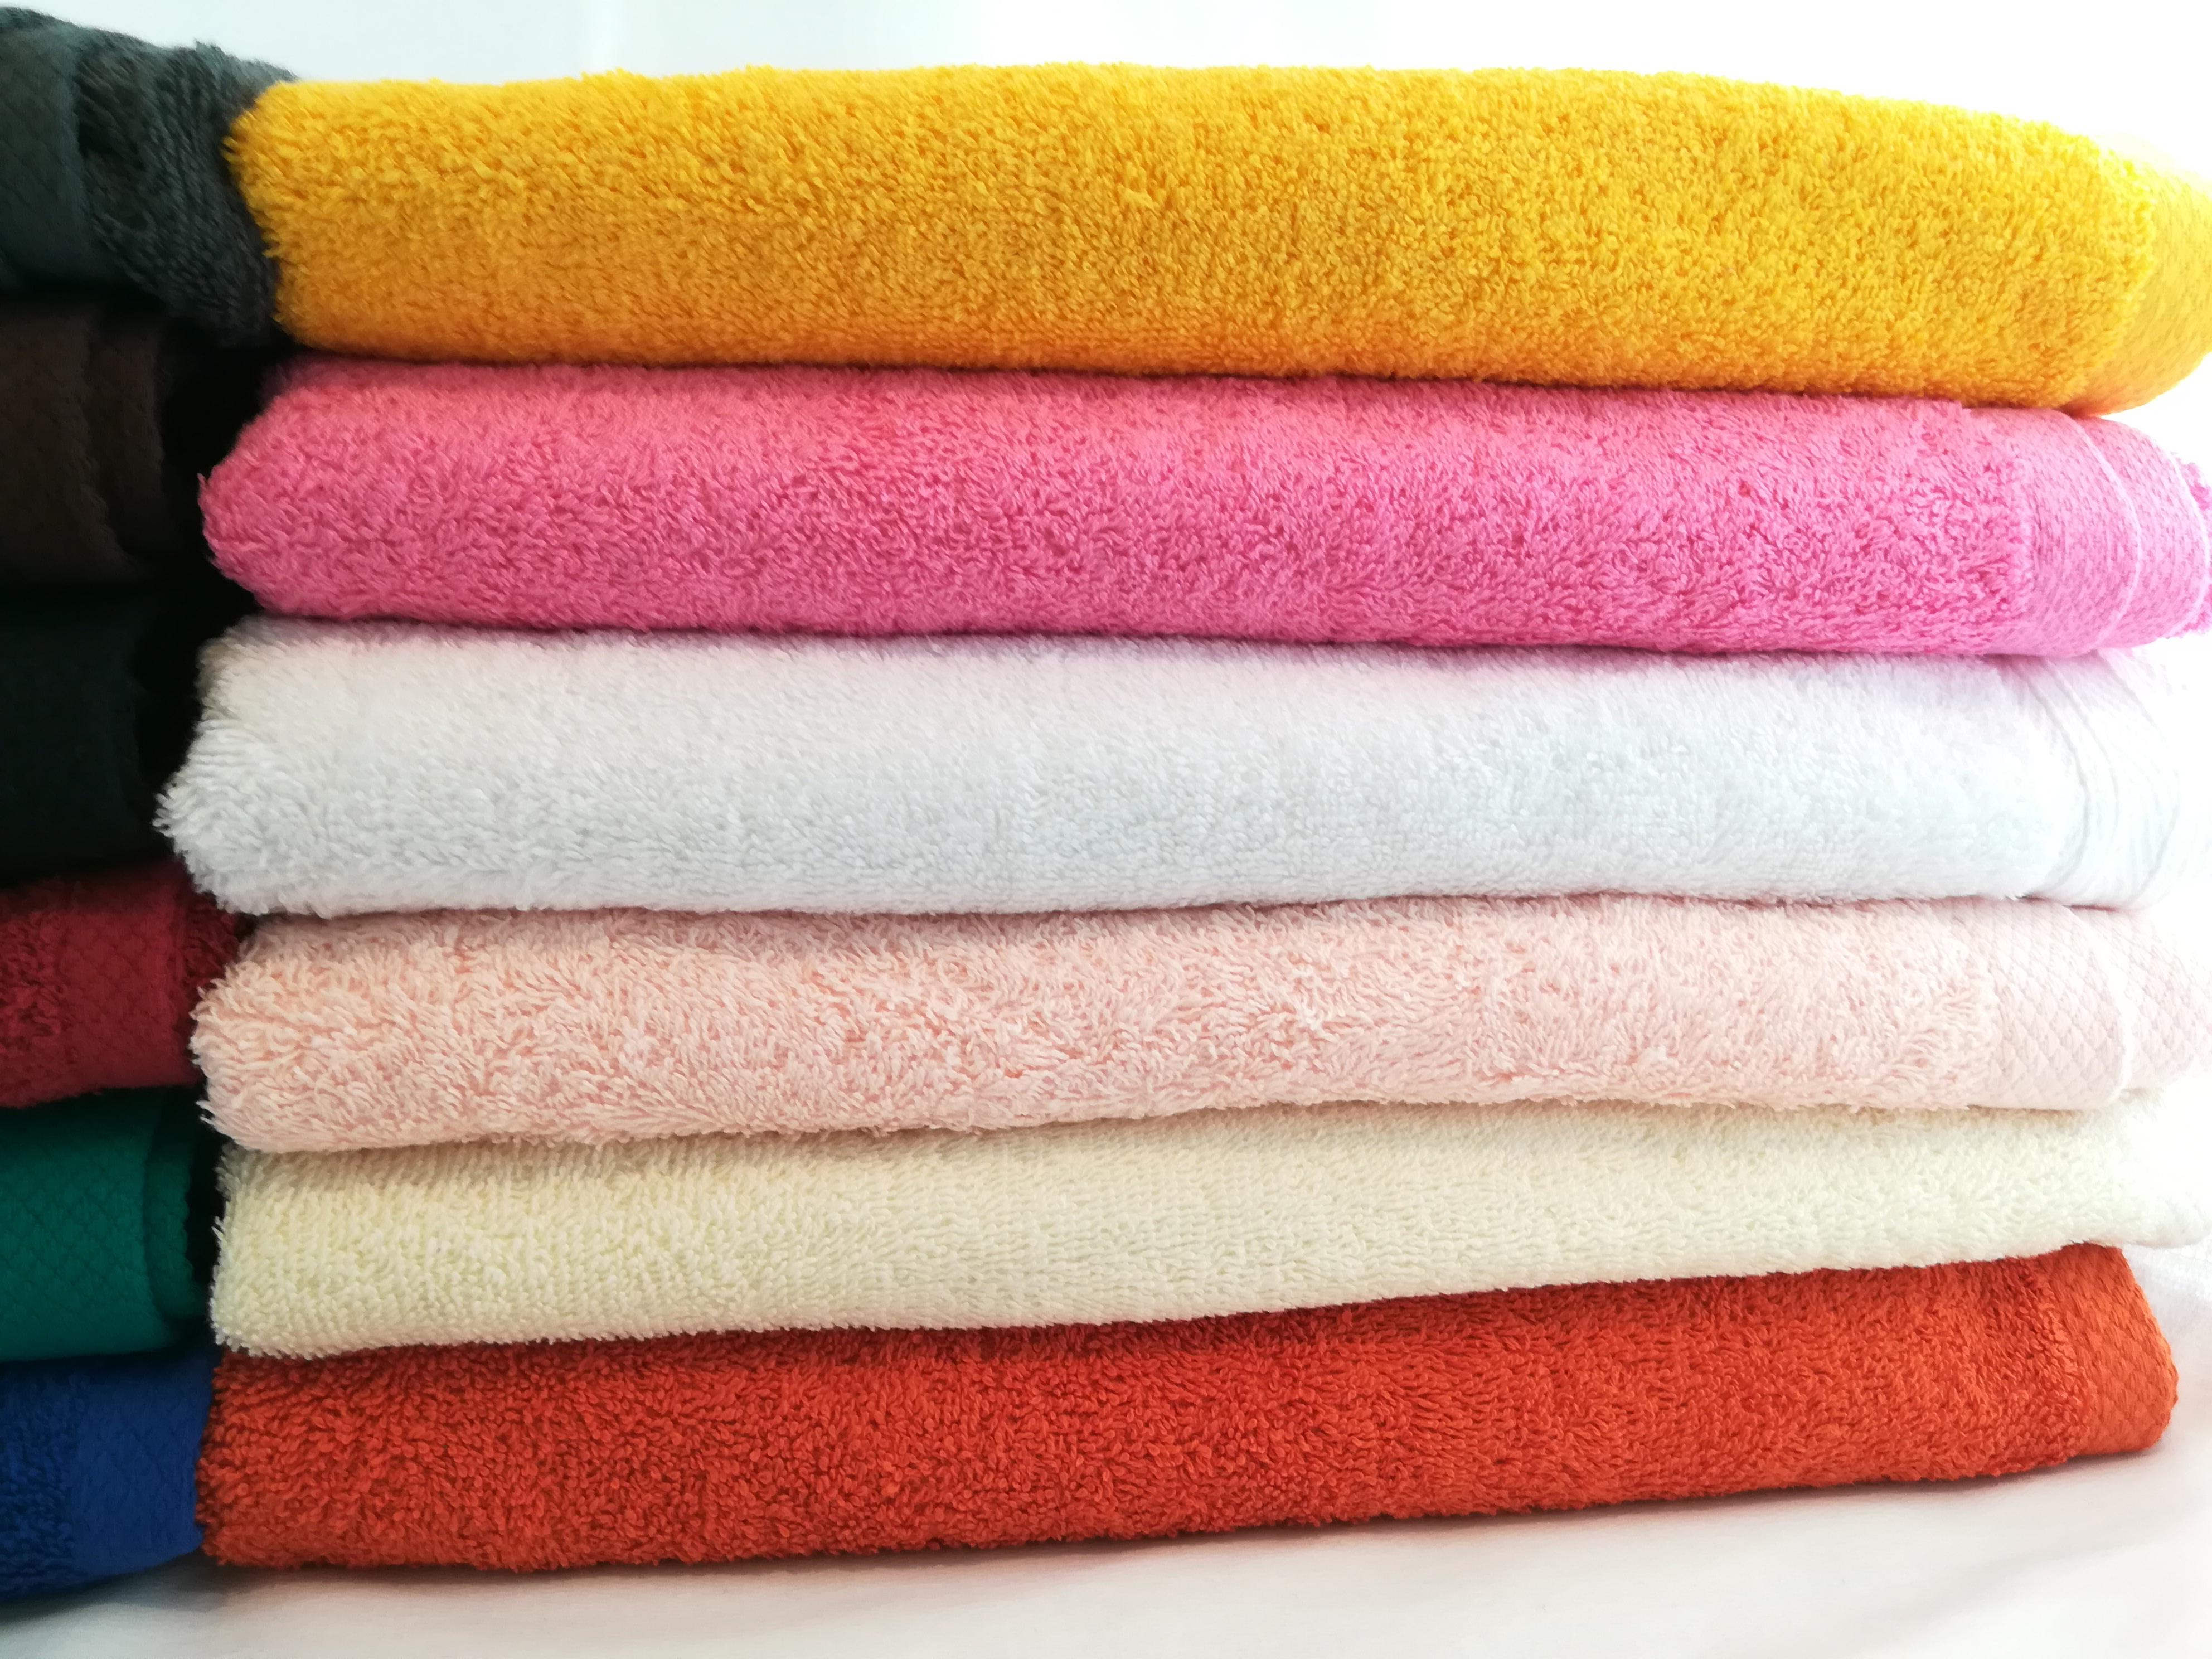 Giovanni Dolcinotti Bath Collection 100/% algod/ón fabricado en Italia Juego de toallas de ba/ño de rizo arena, 2